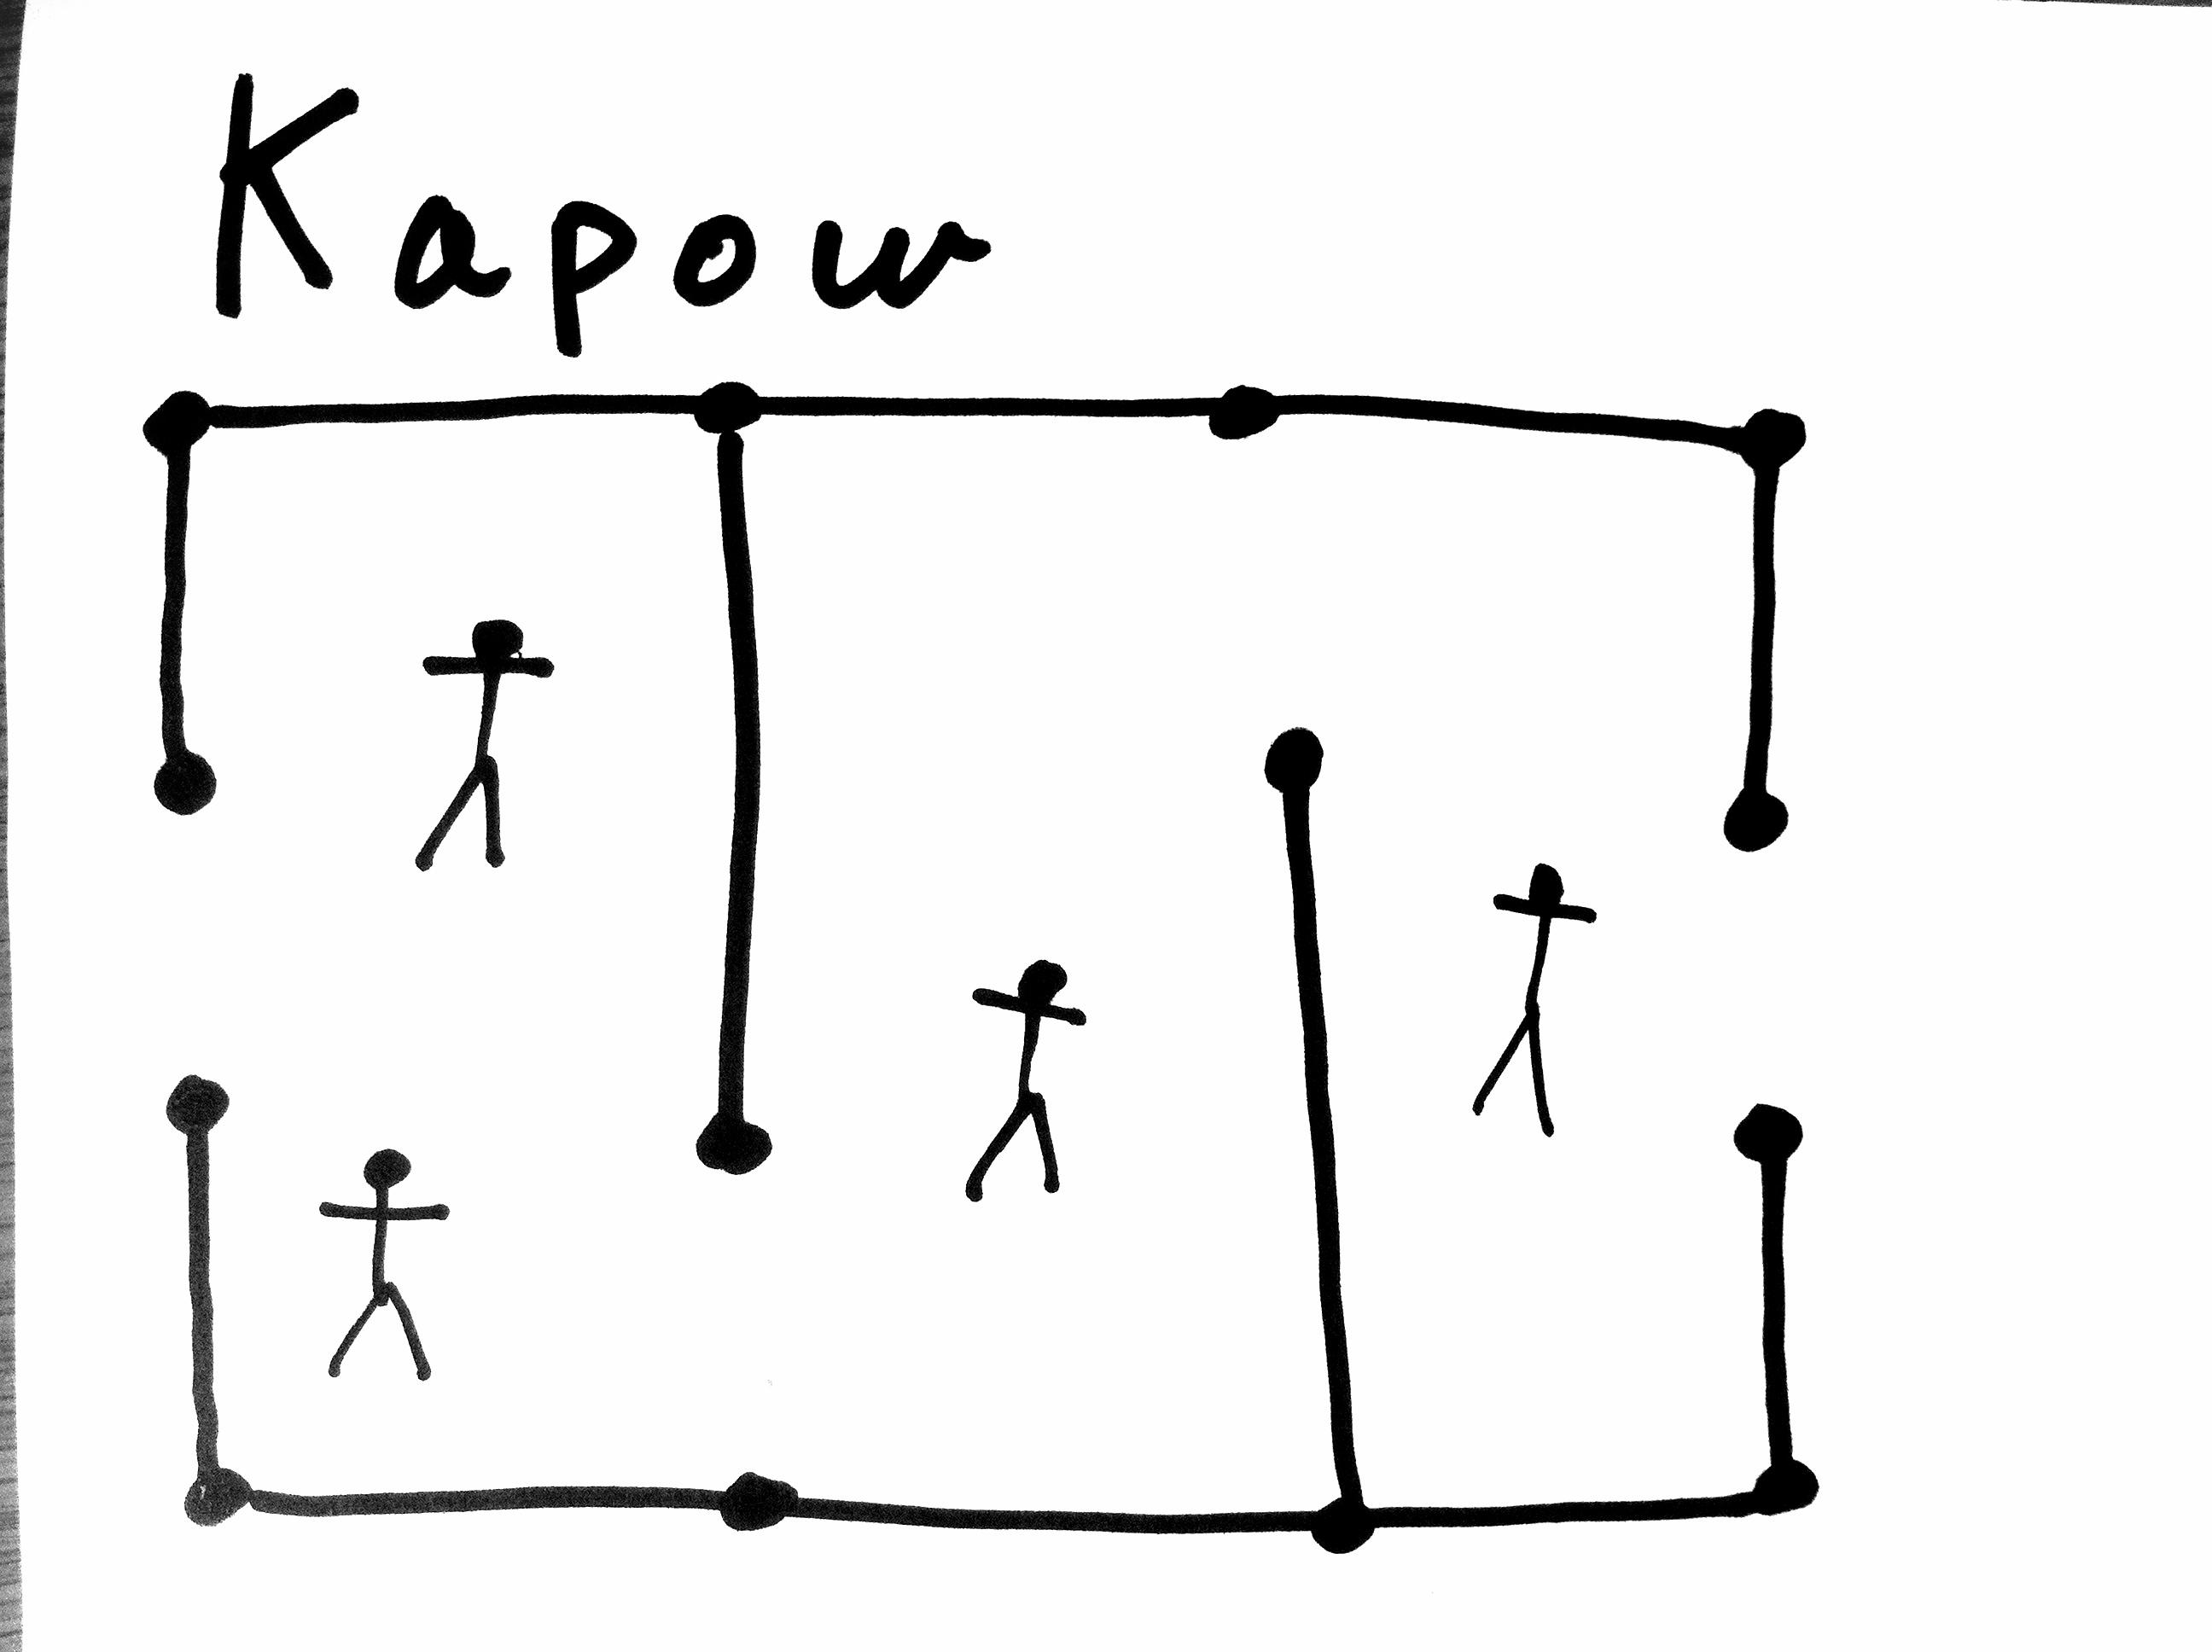 Kapow field drawing